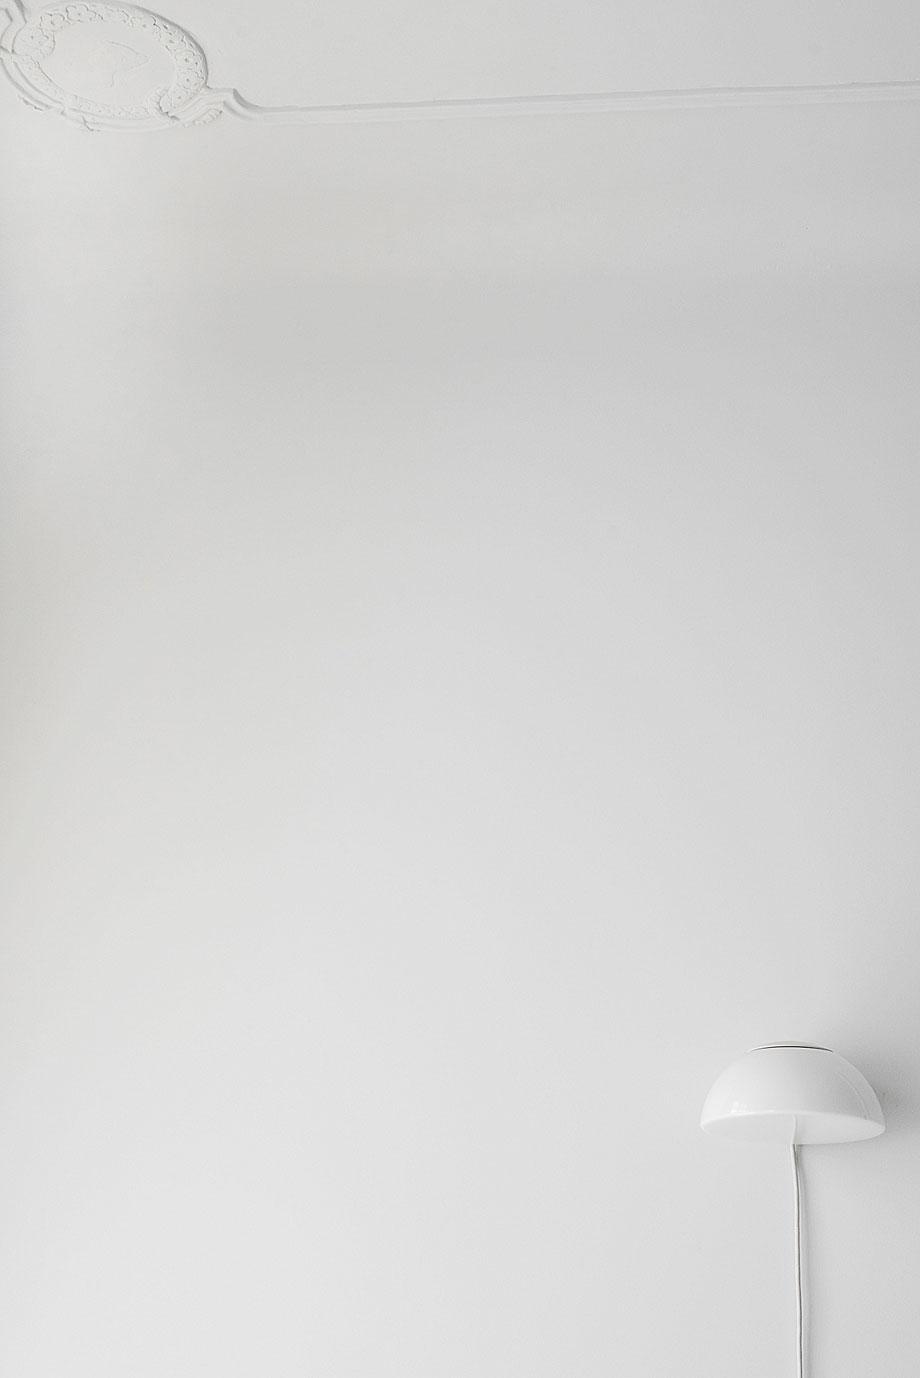 apartamento-tenement-loft-kolasinski (10)